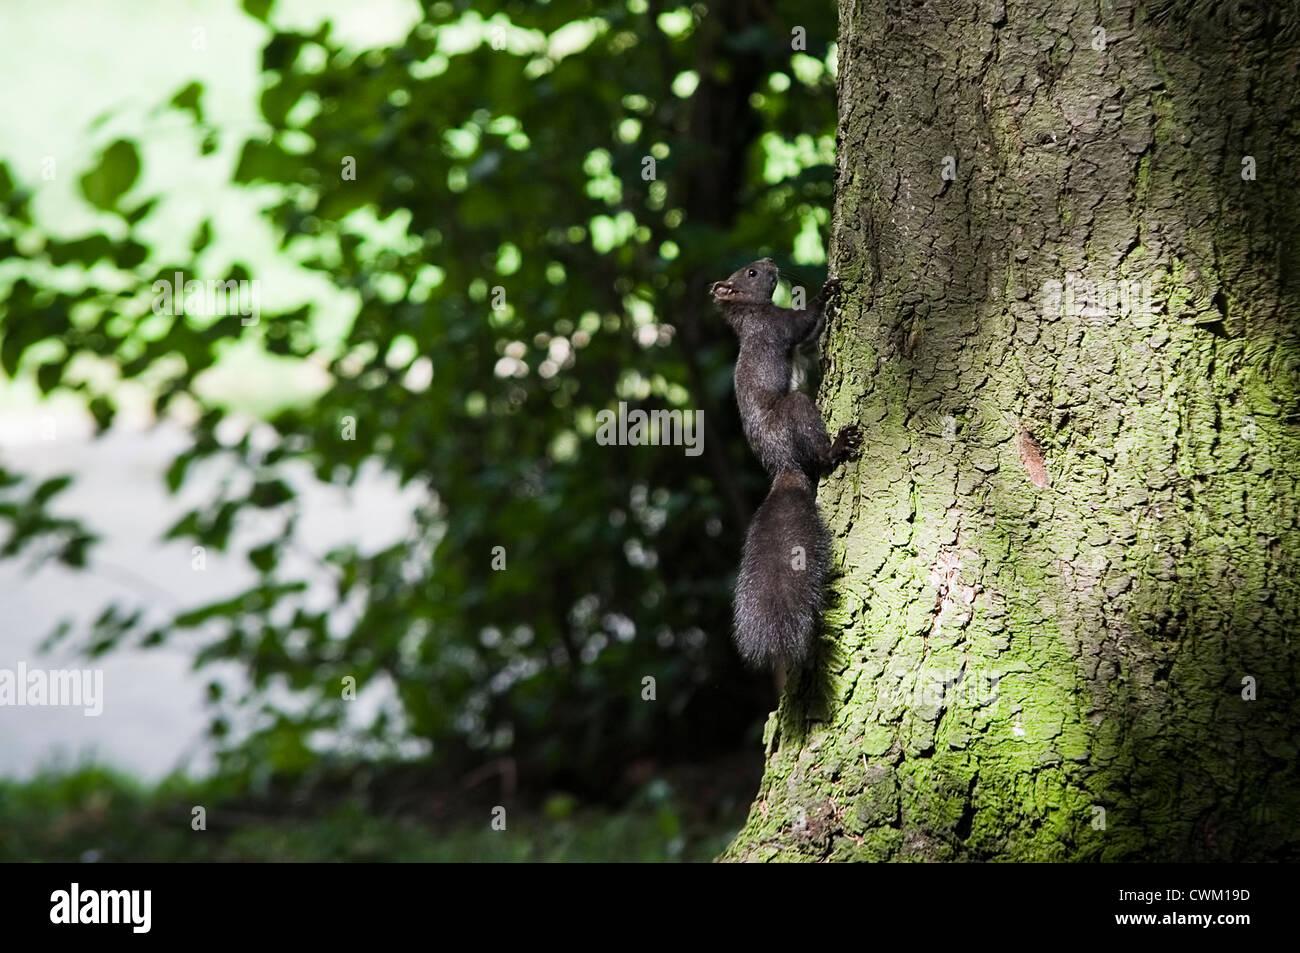 L'écureuil noir climbing tree in forest Photo Stock